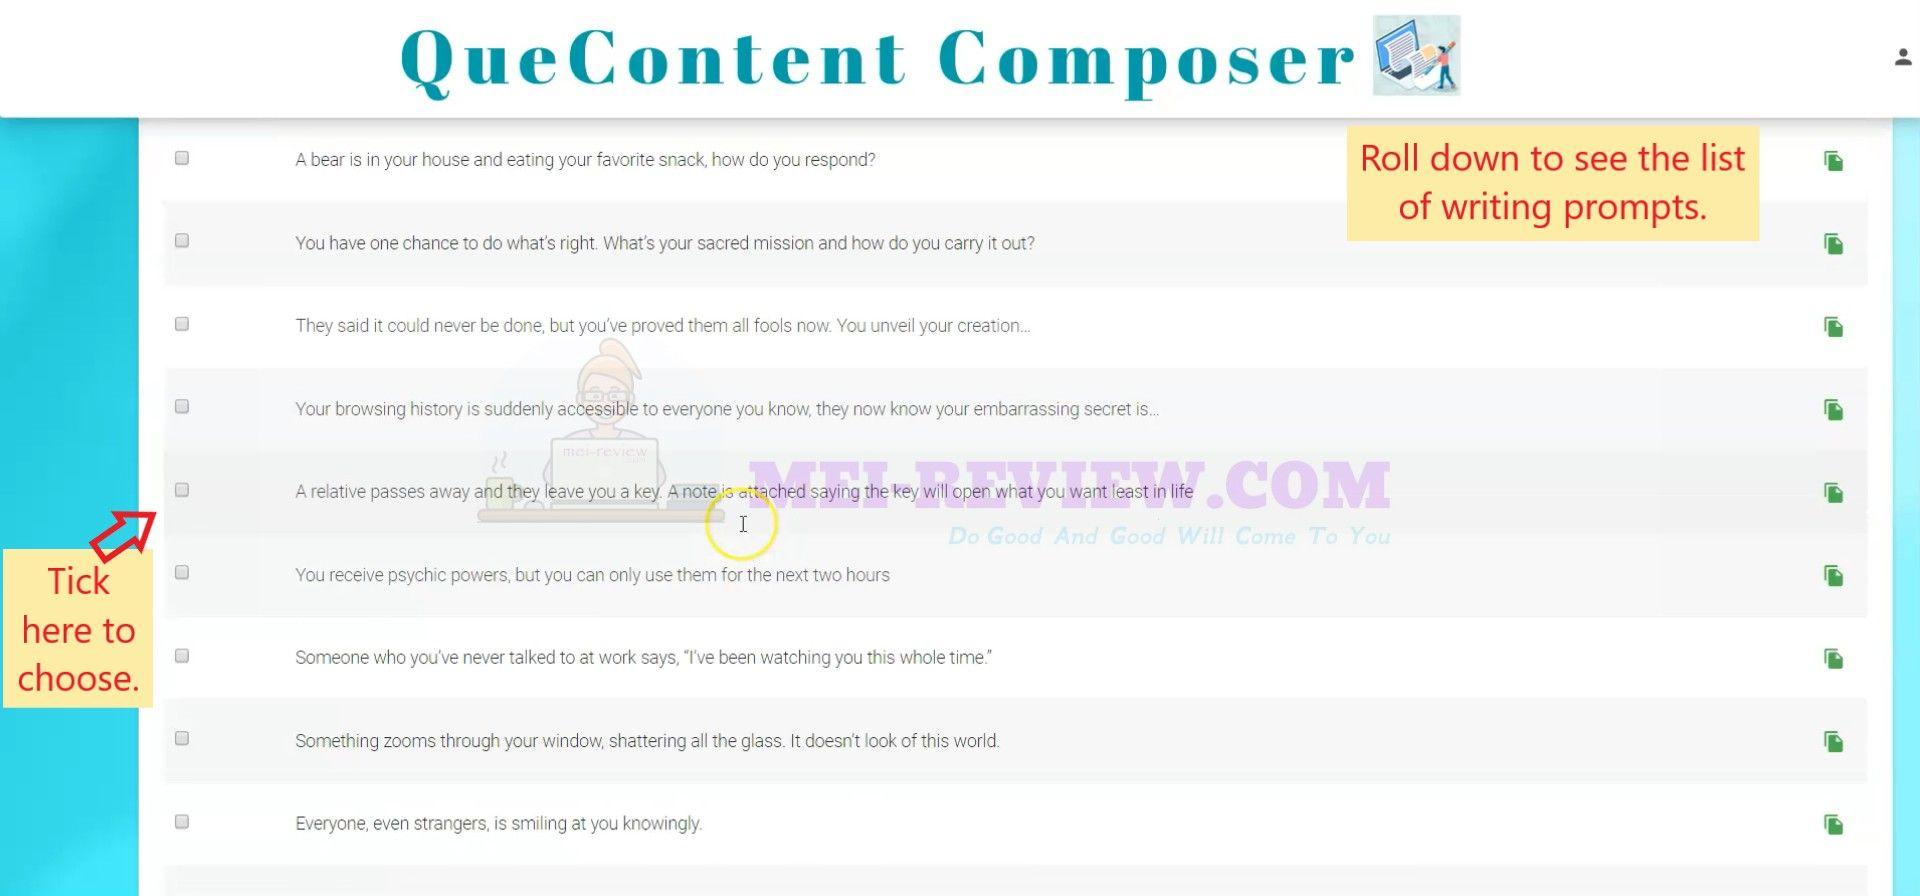 QueContent-Composer-how-to-use-4